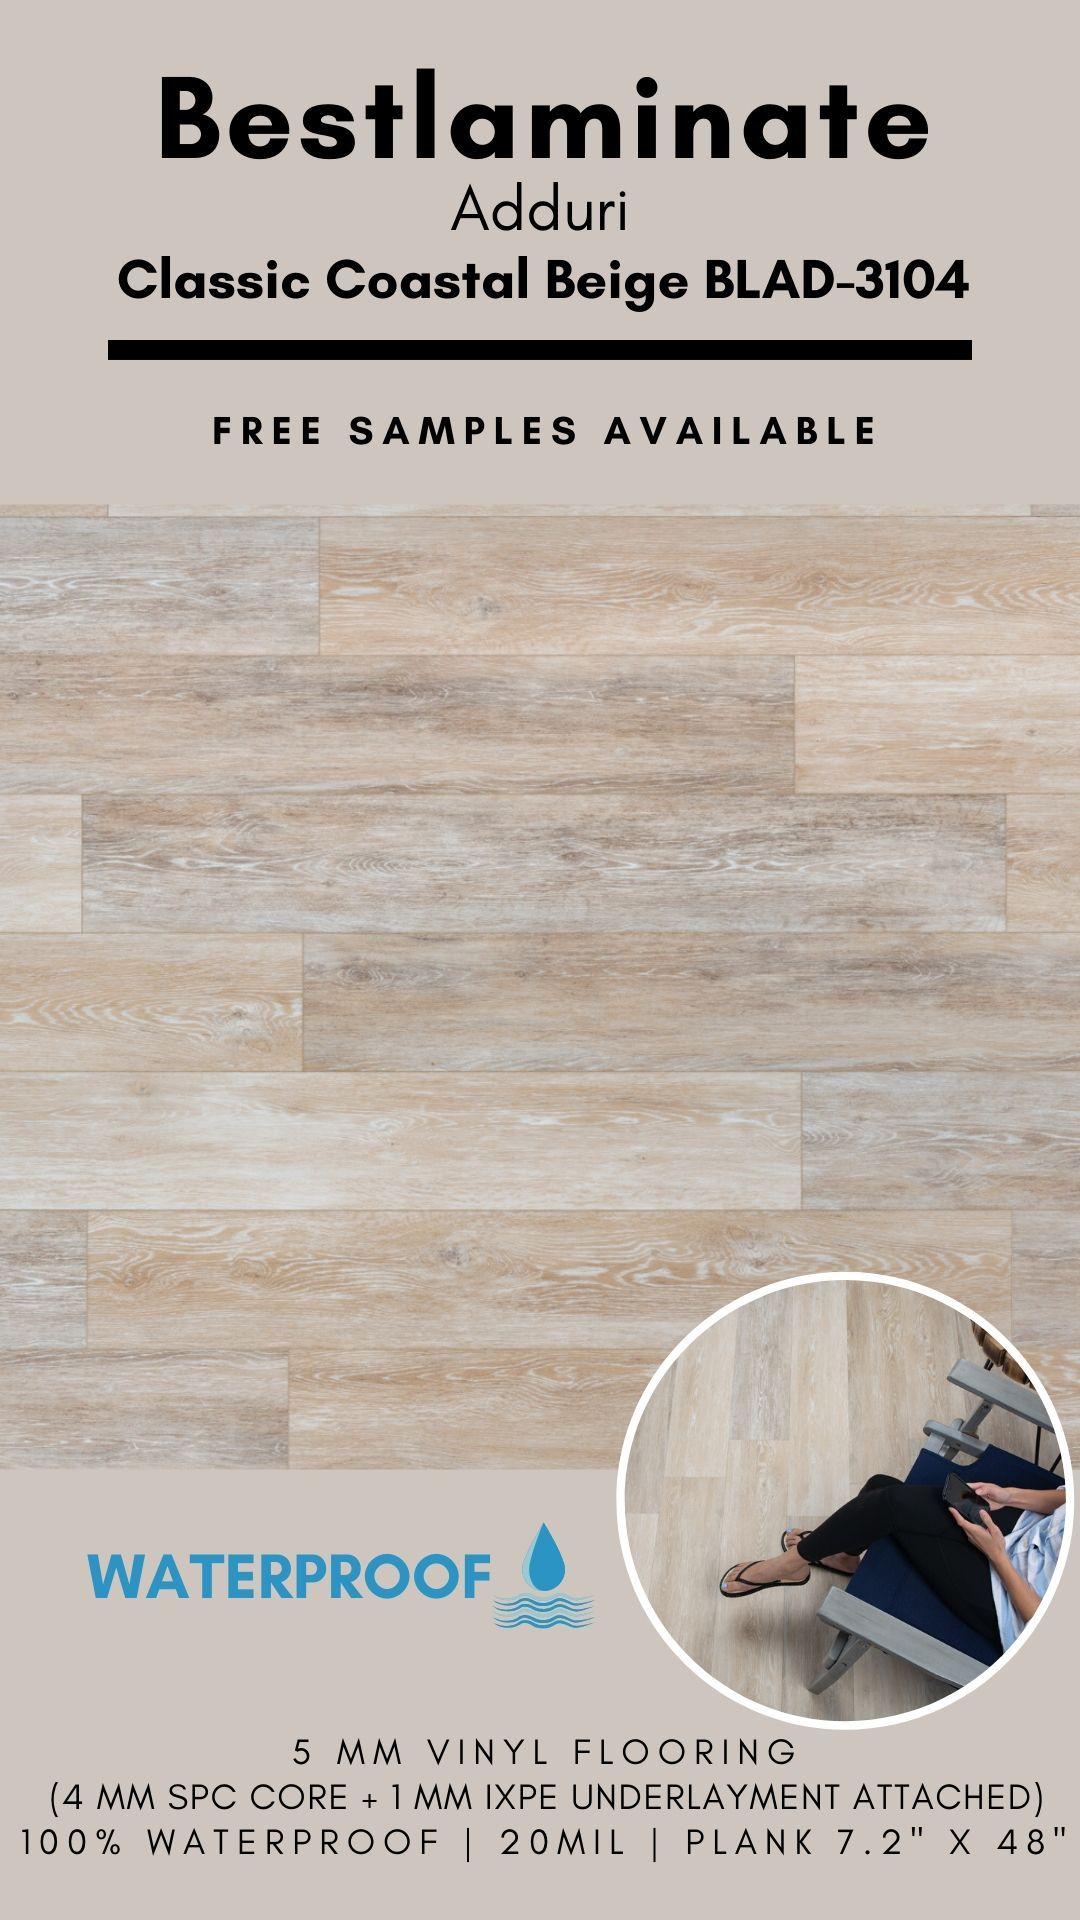 Bestlaminate Adduri Classic Coastal Beige Blad 3104 Luxury Spc Vinyl Flooring In 2020 Vinyl Flooring Flooring Luxury Vinyl Plank Flooring